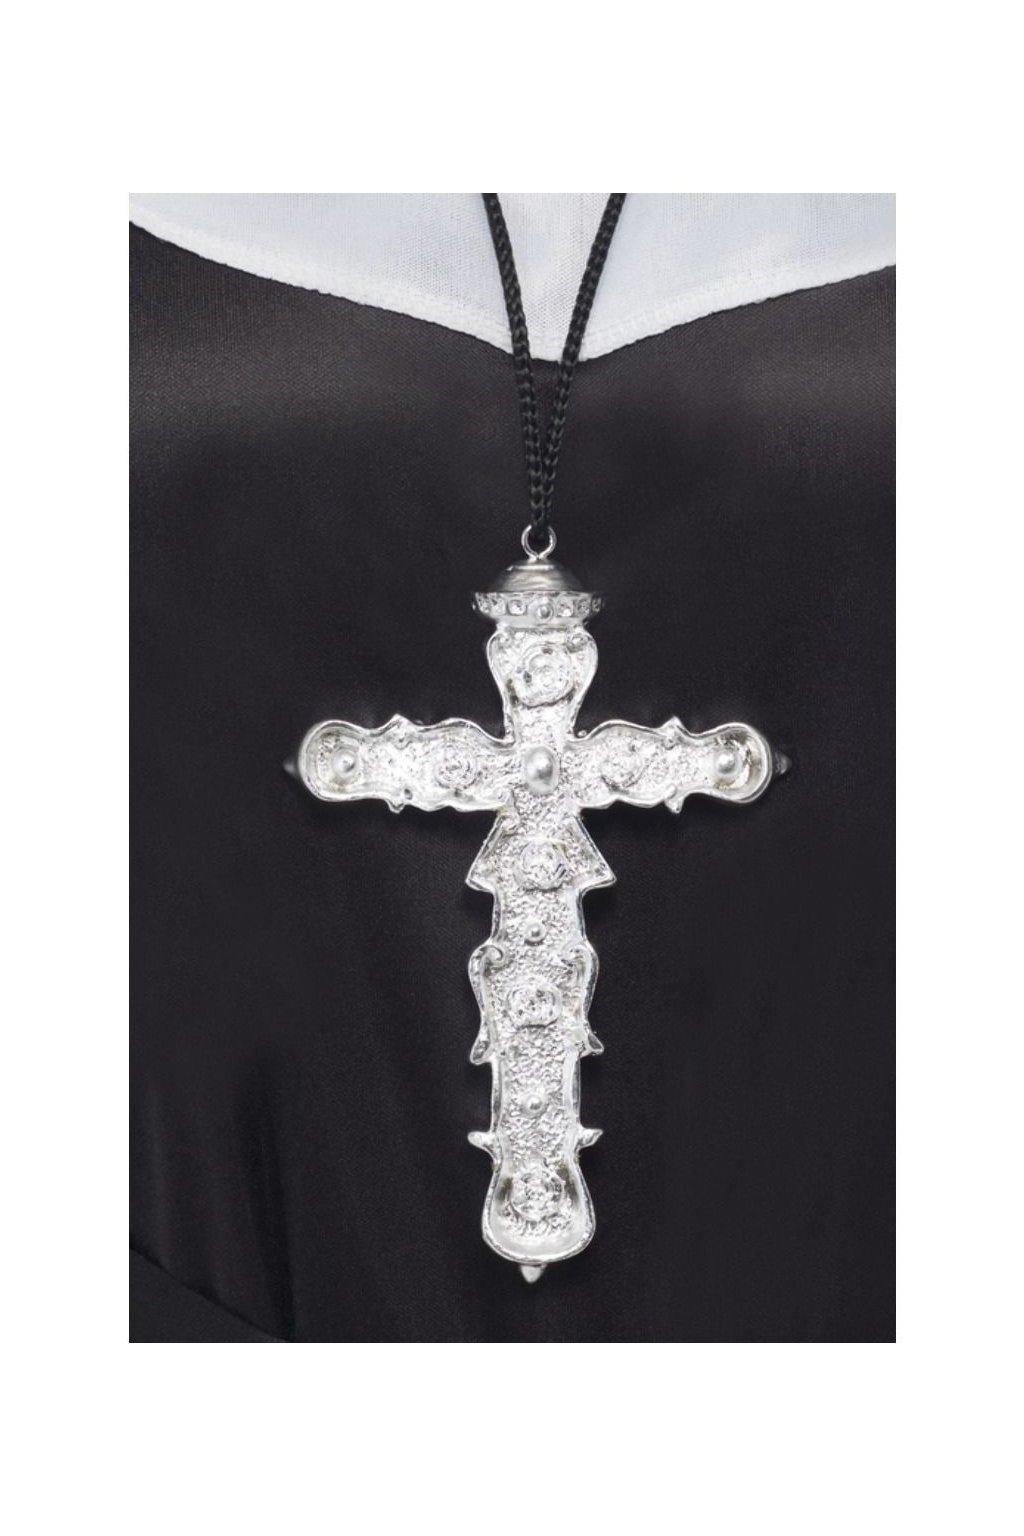 Kříž stříbrný 15cm